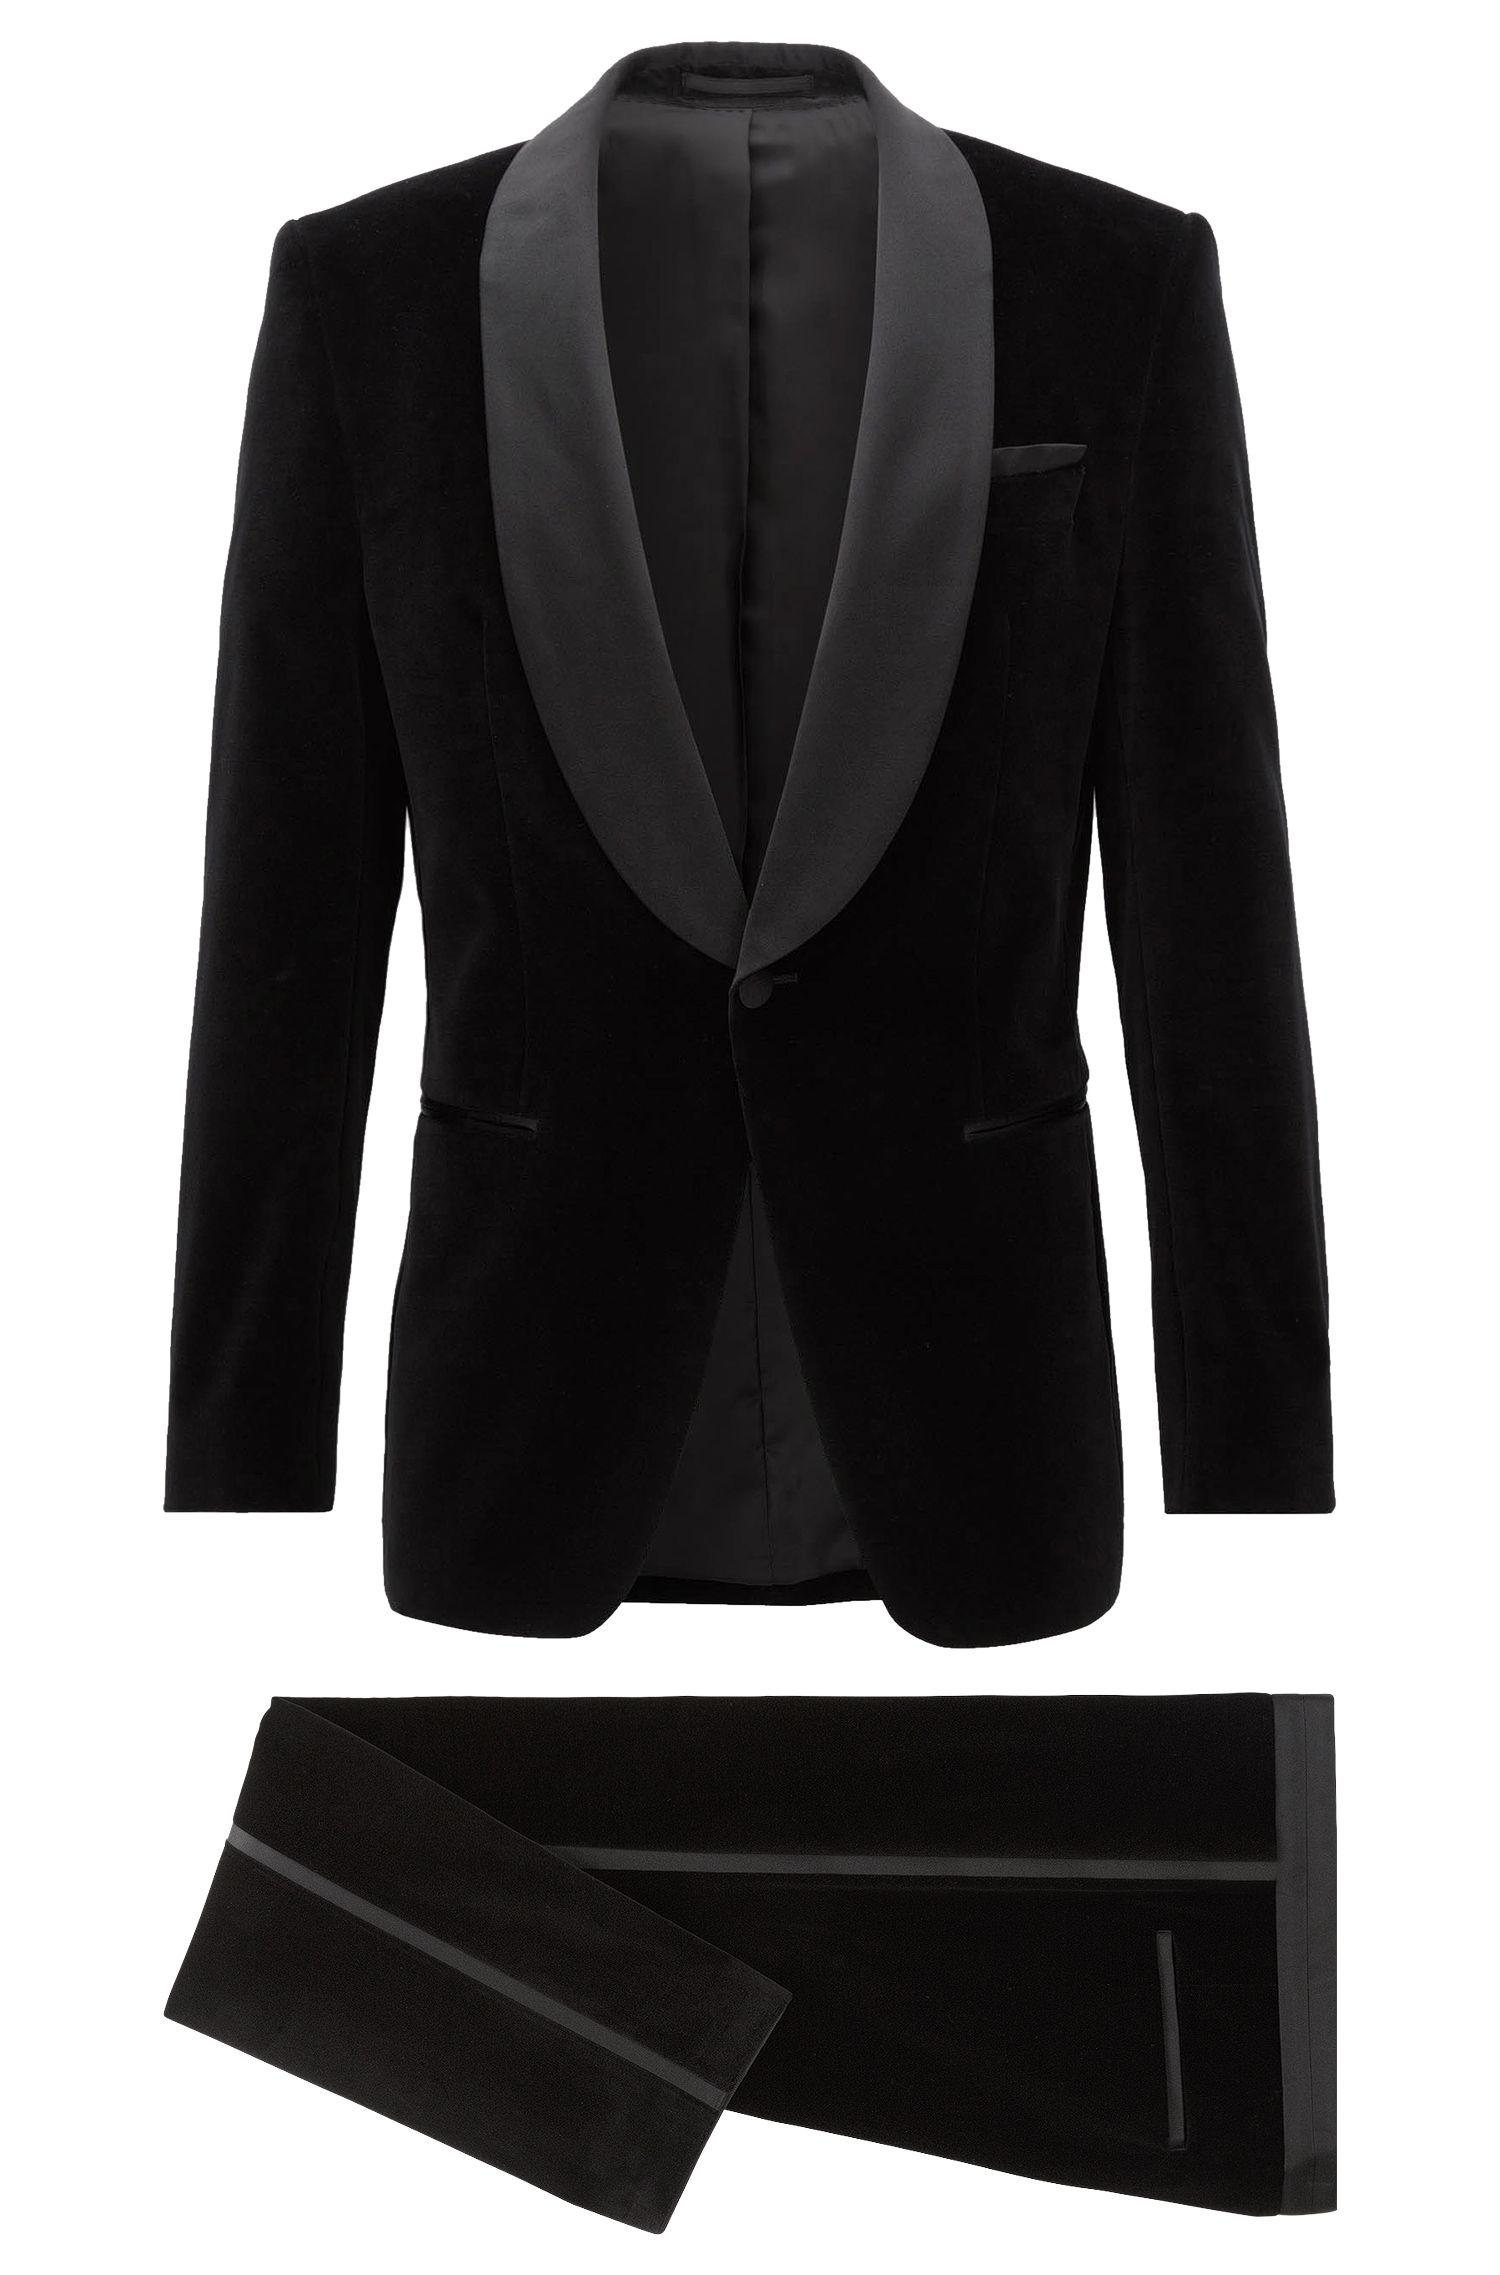 Velvet Tuxedo, Slim Fit | Herwyn/Gewon